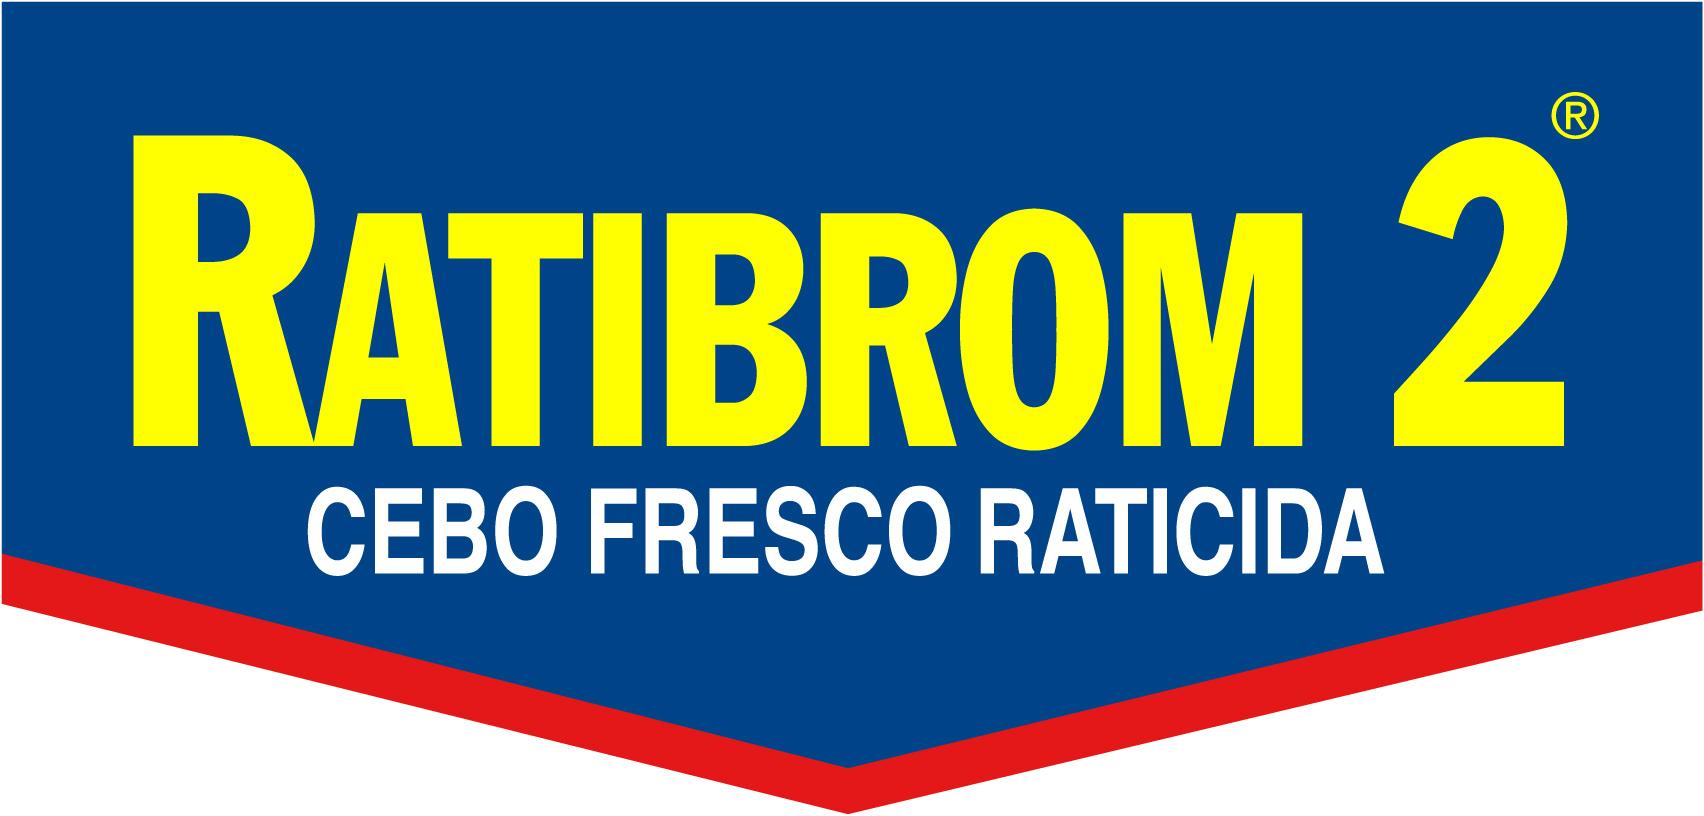 ratibrom-2015